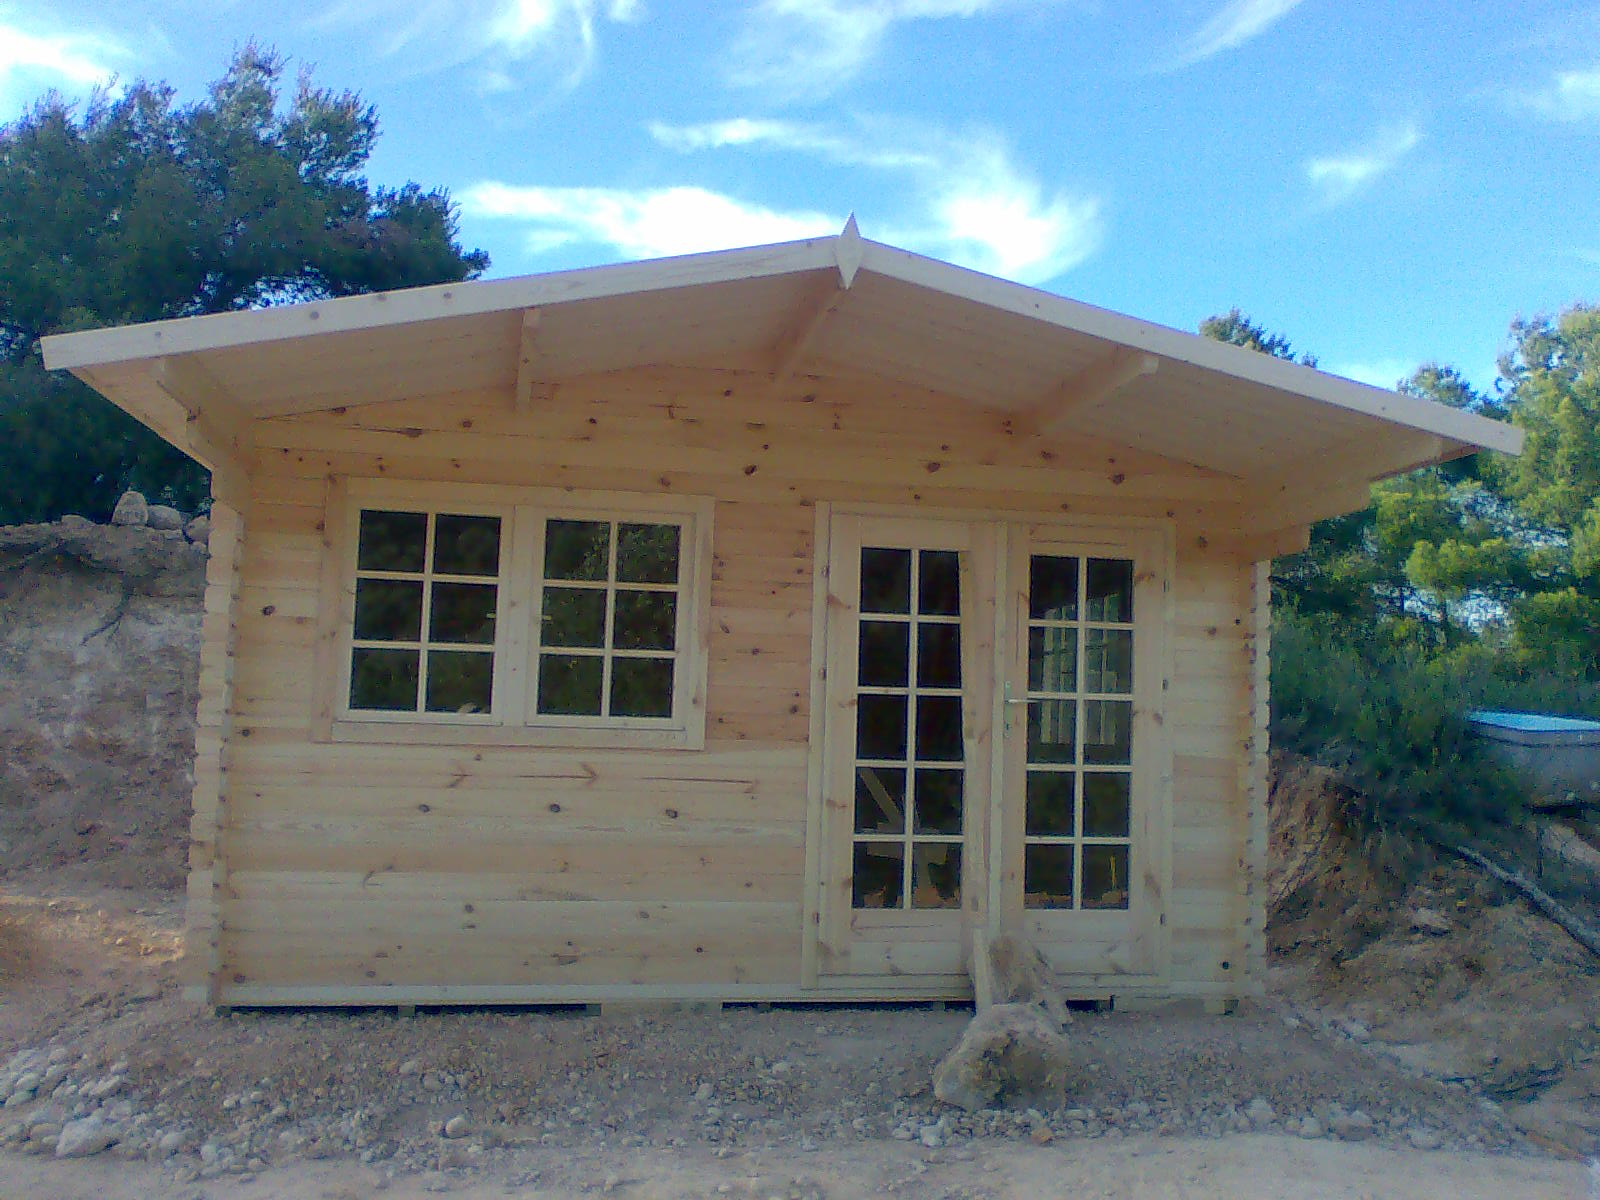 Aventuras en la palma d ebre la casita de madera - La casita de madera ...